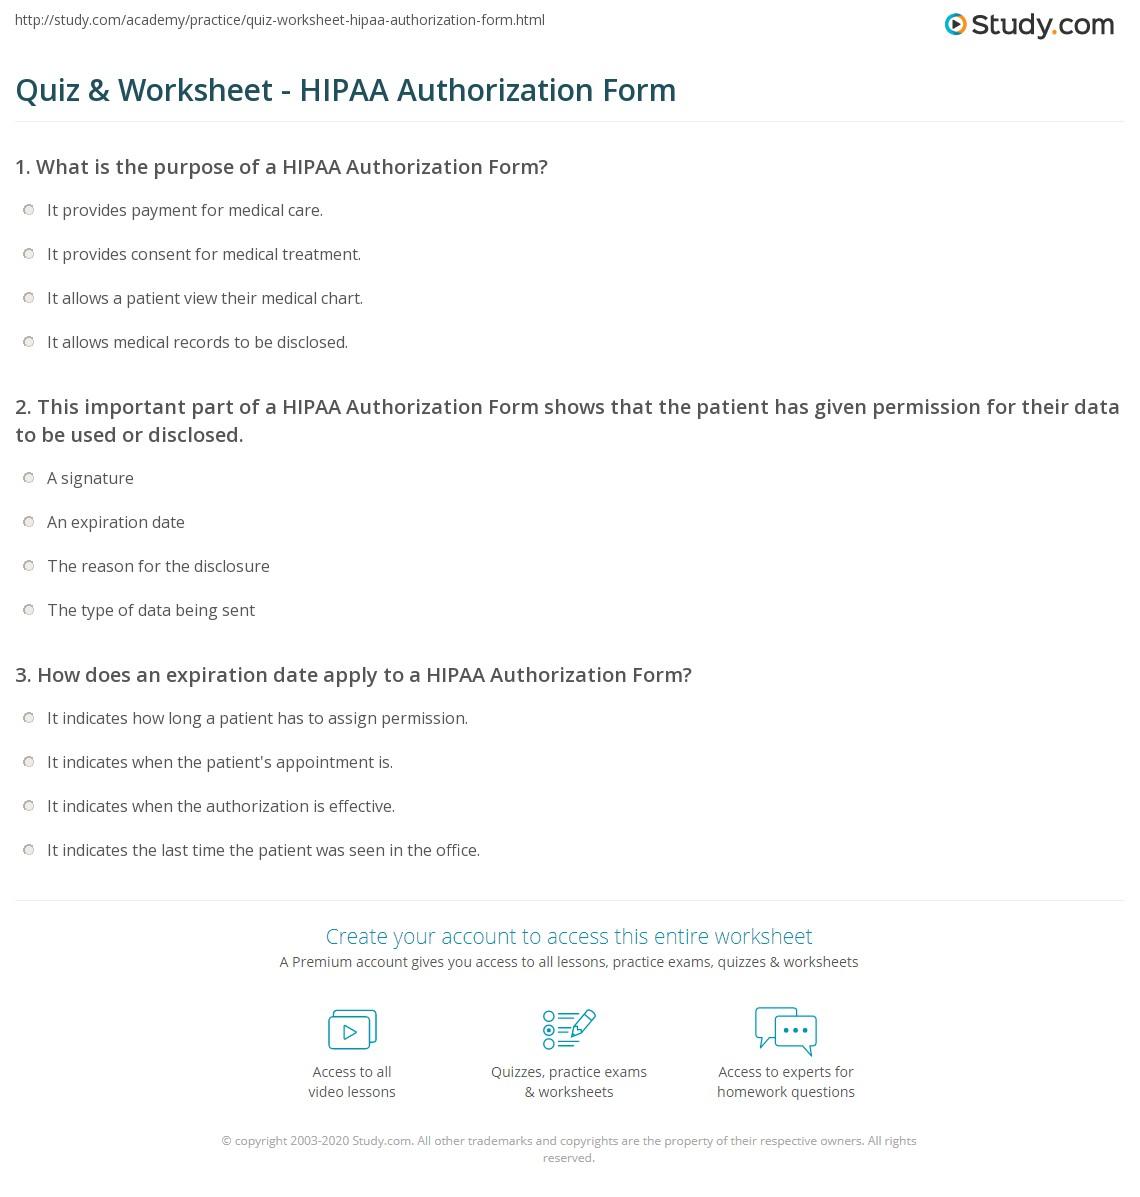 Quiz & Worksheet - HIPAA Authorization Form | Study.com